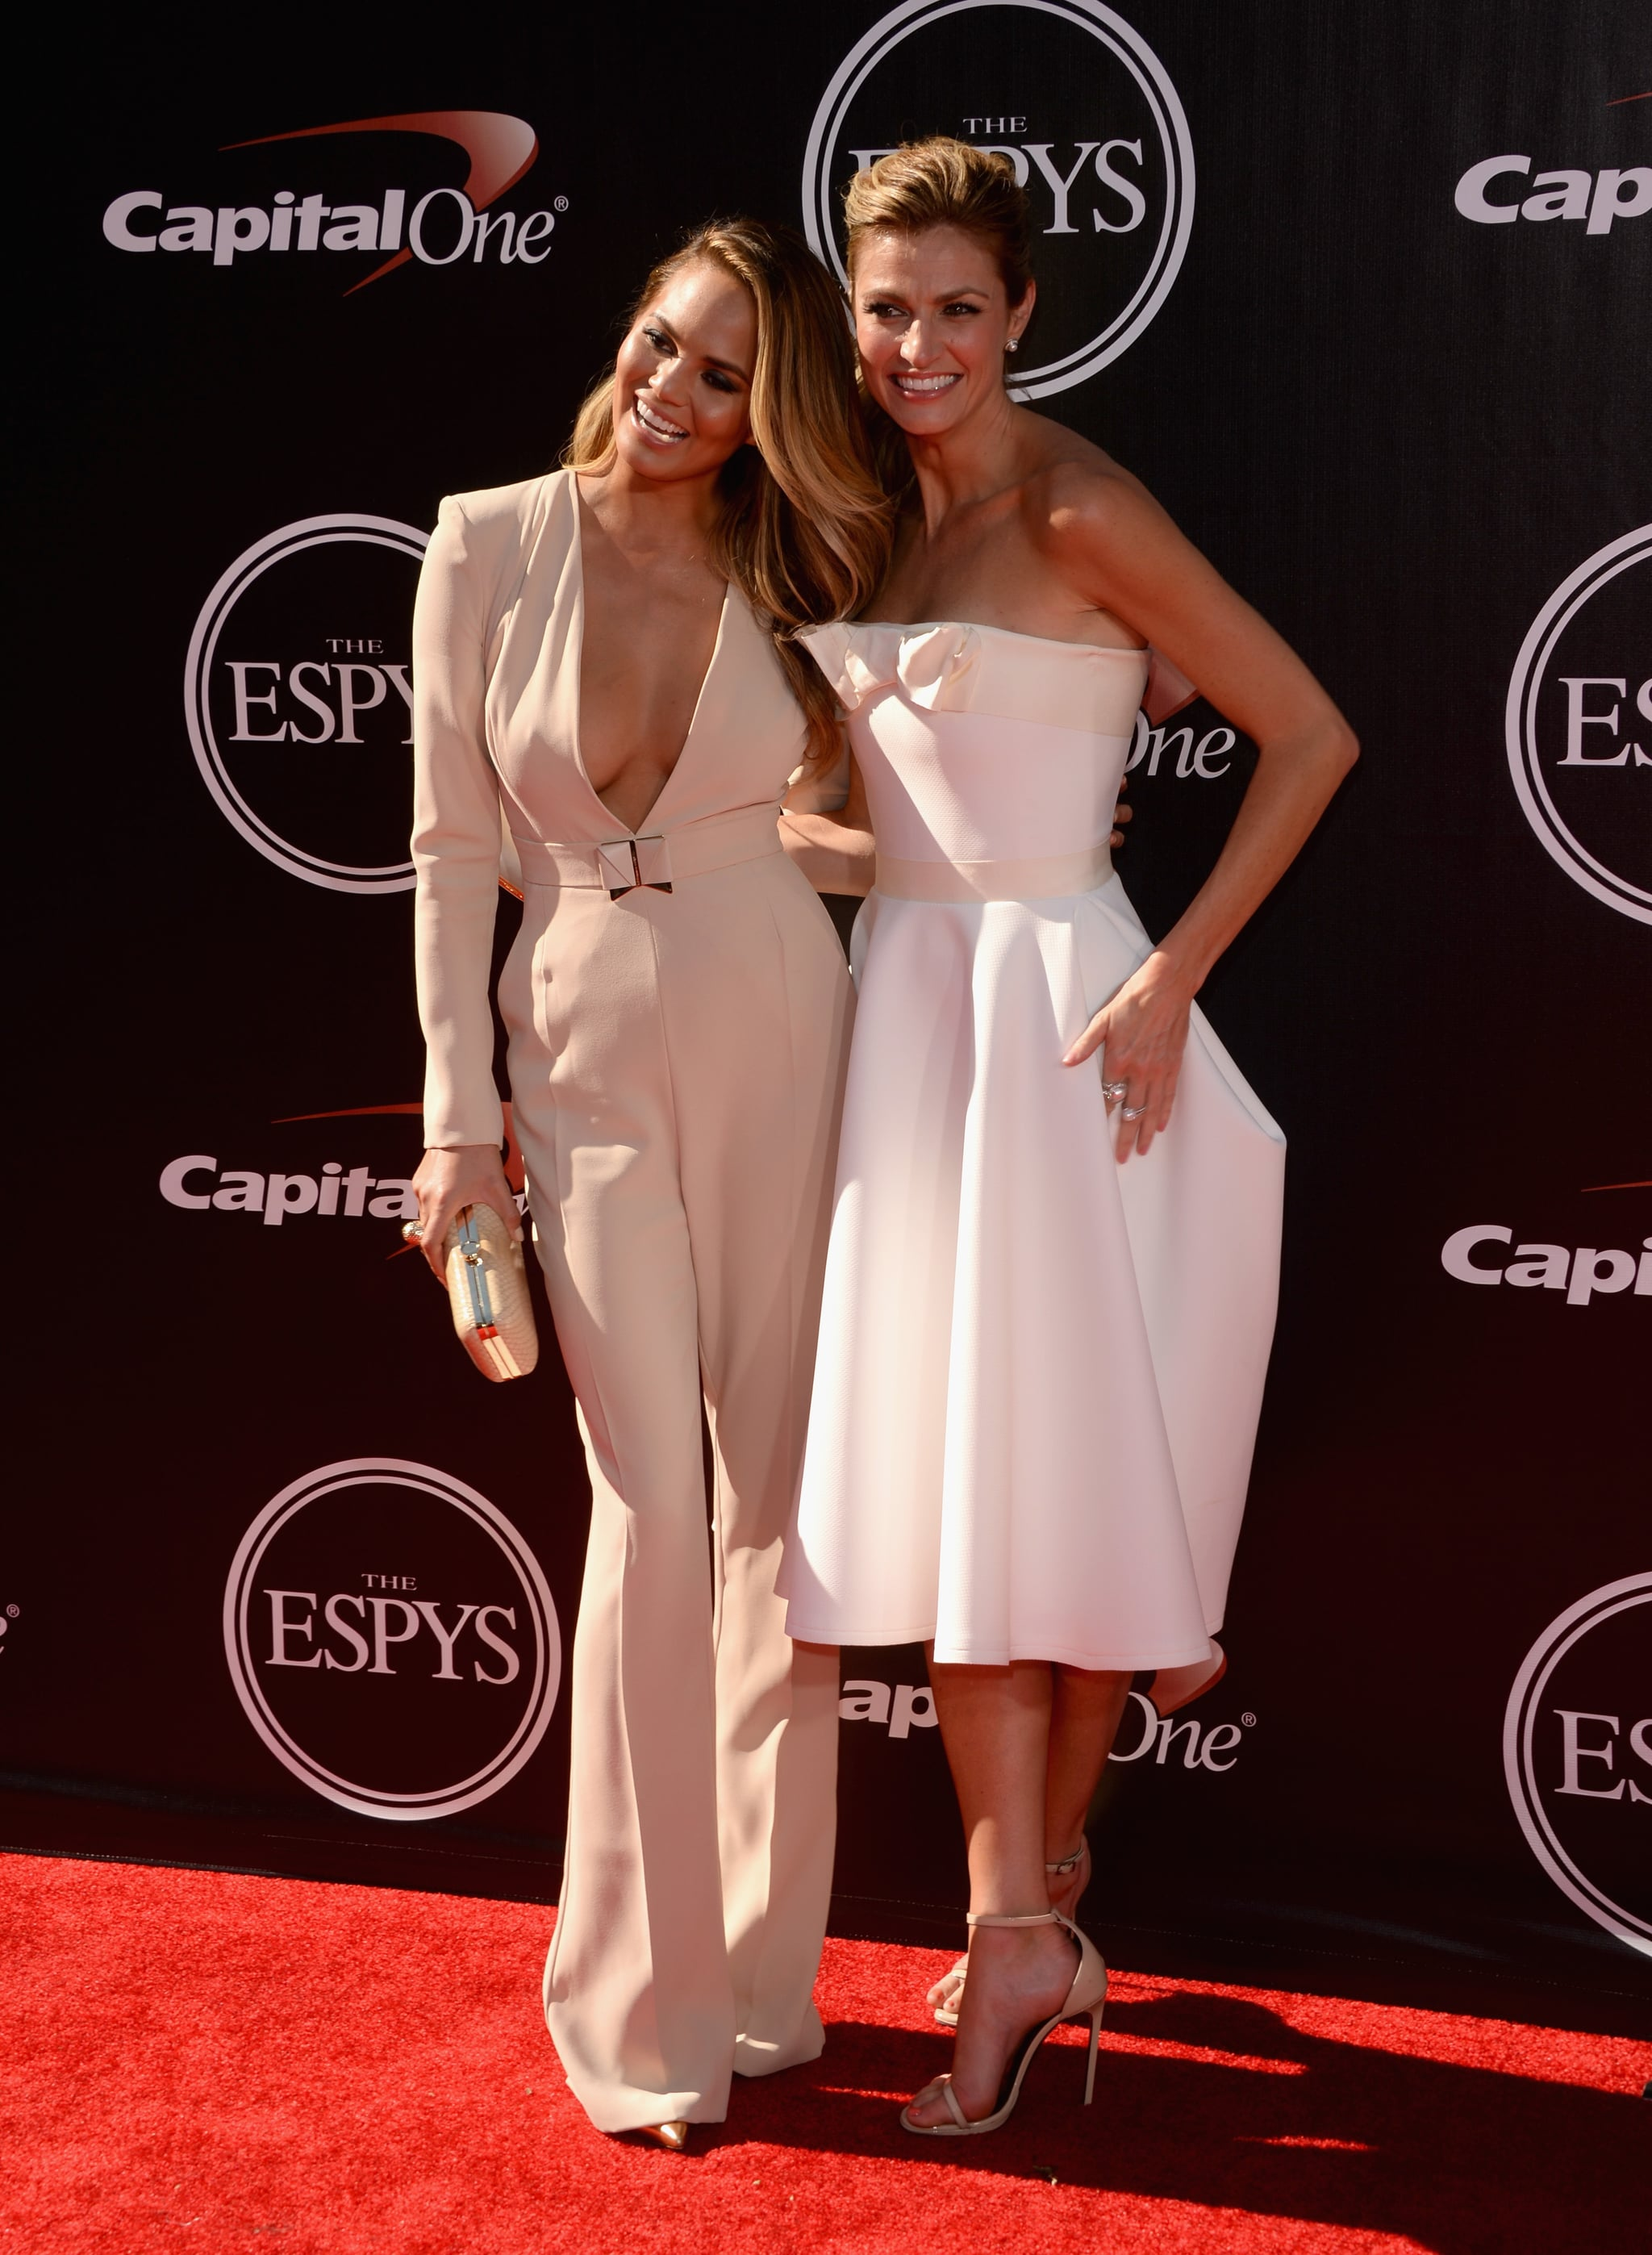 Chrissy Teigen and Erin Andrews